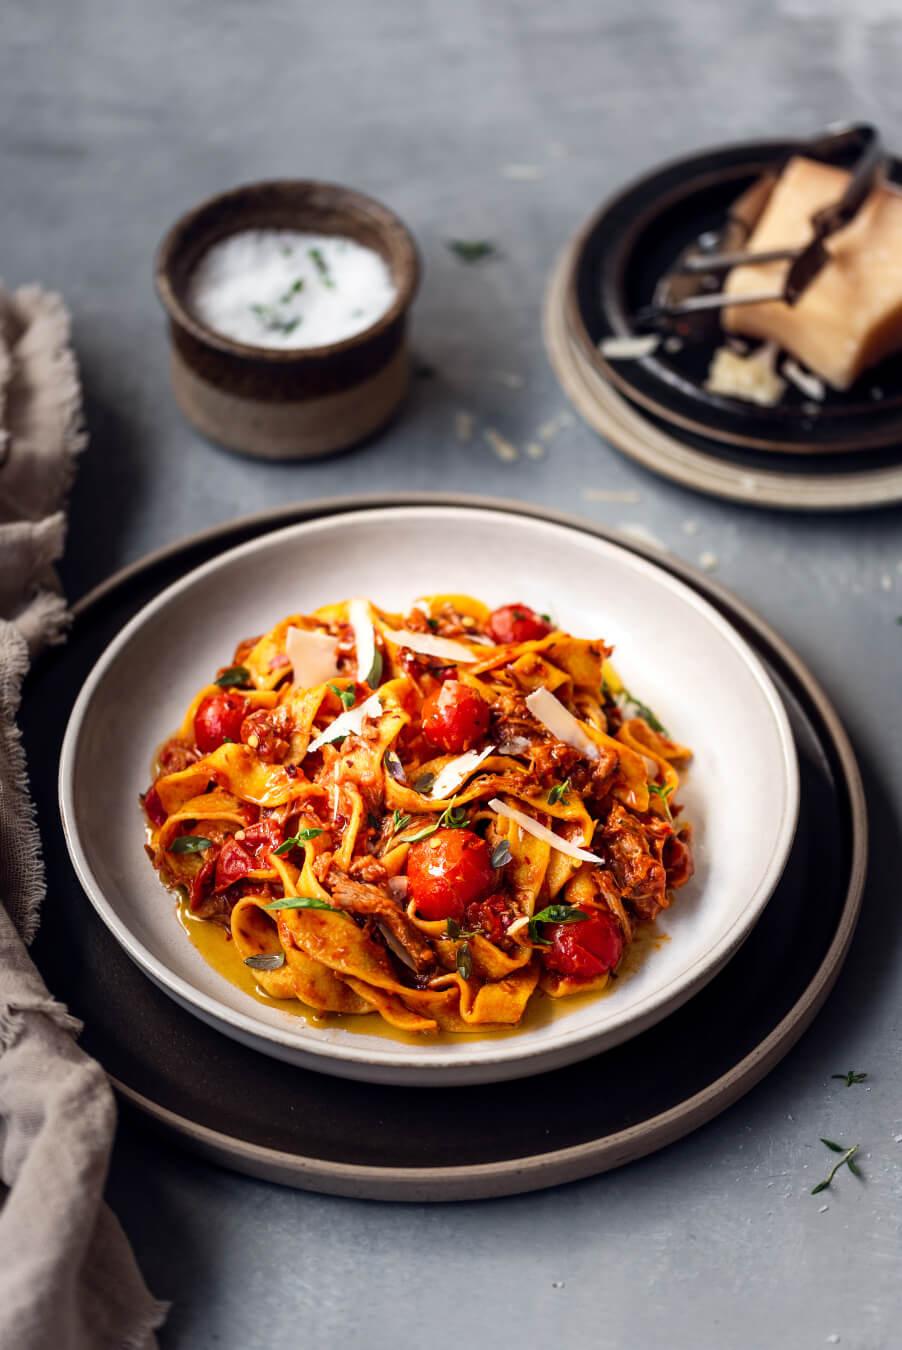 lmabaragú með pappardelle pasta